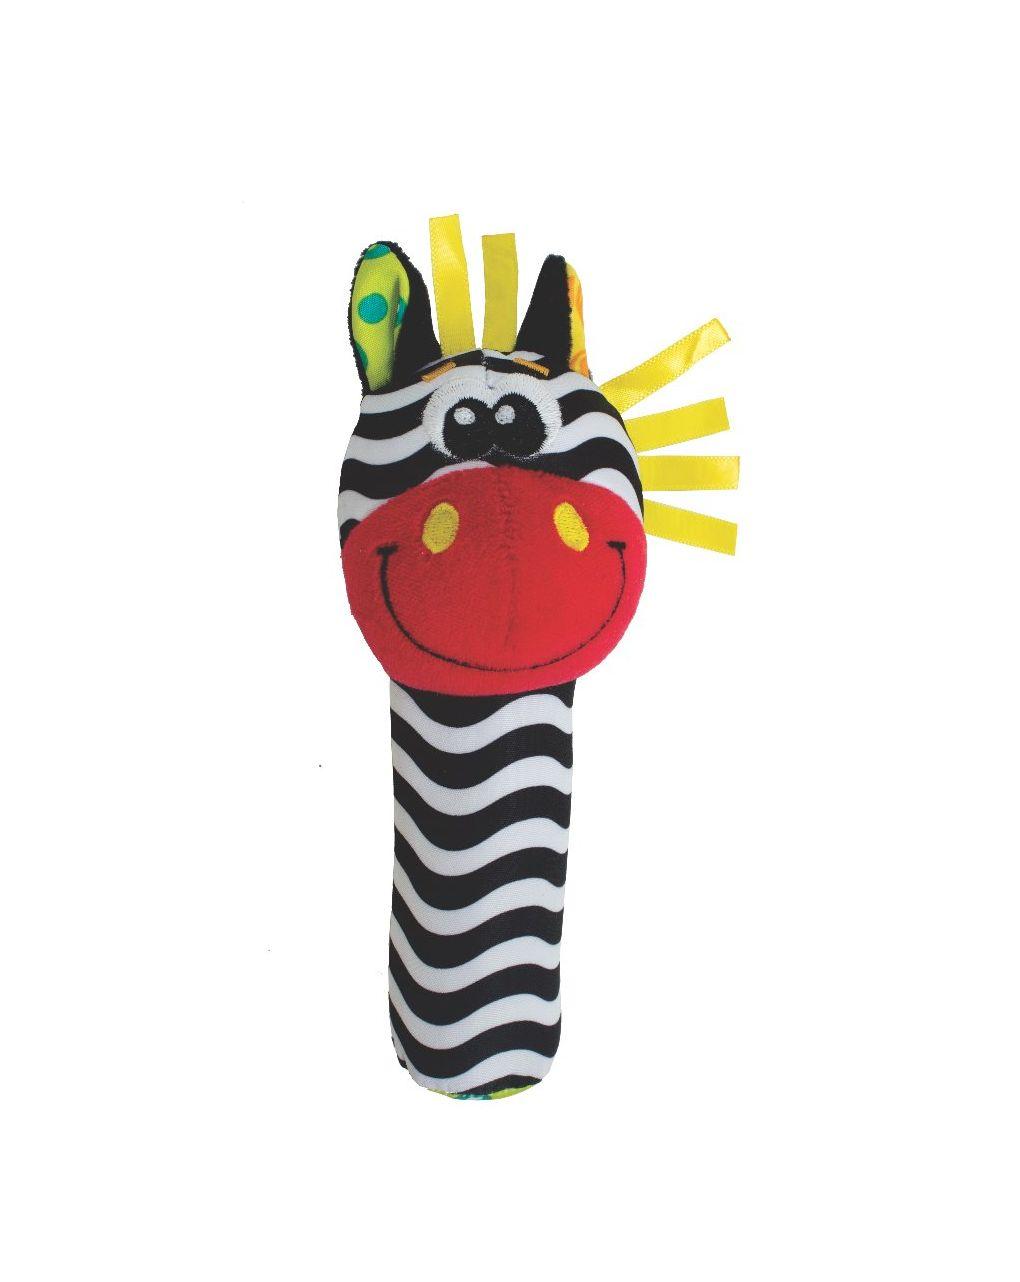 Playgro - jungle squeaker zebra and lion 2 asst - Playgro